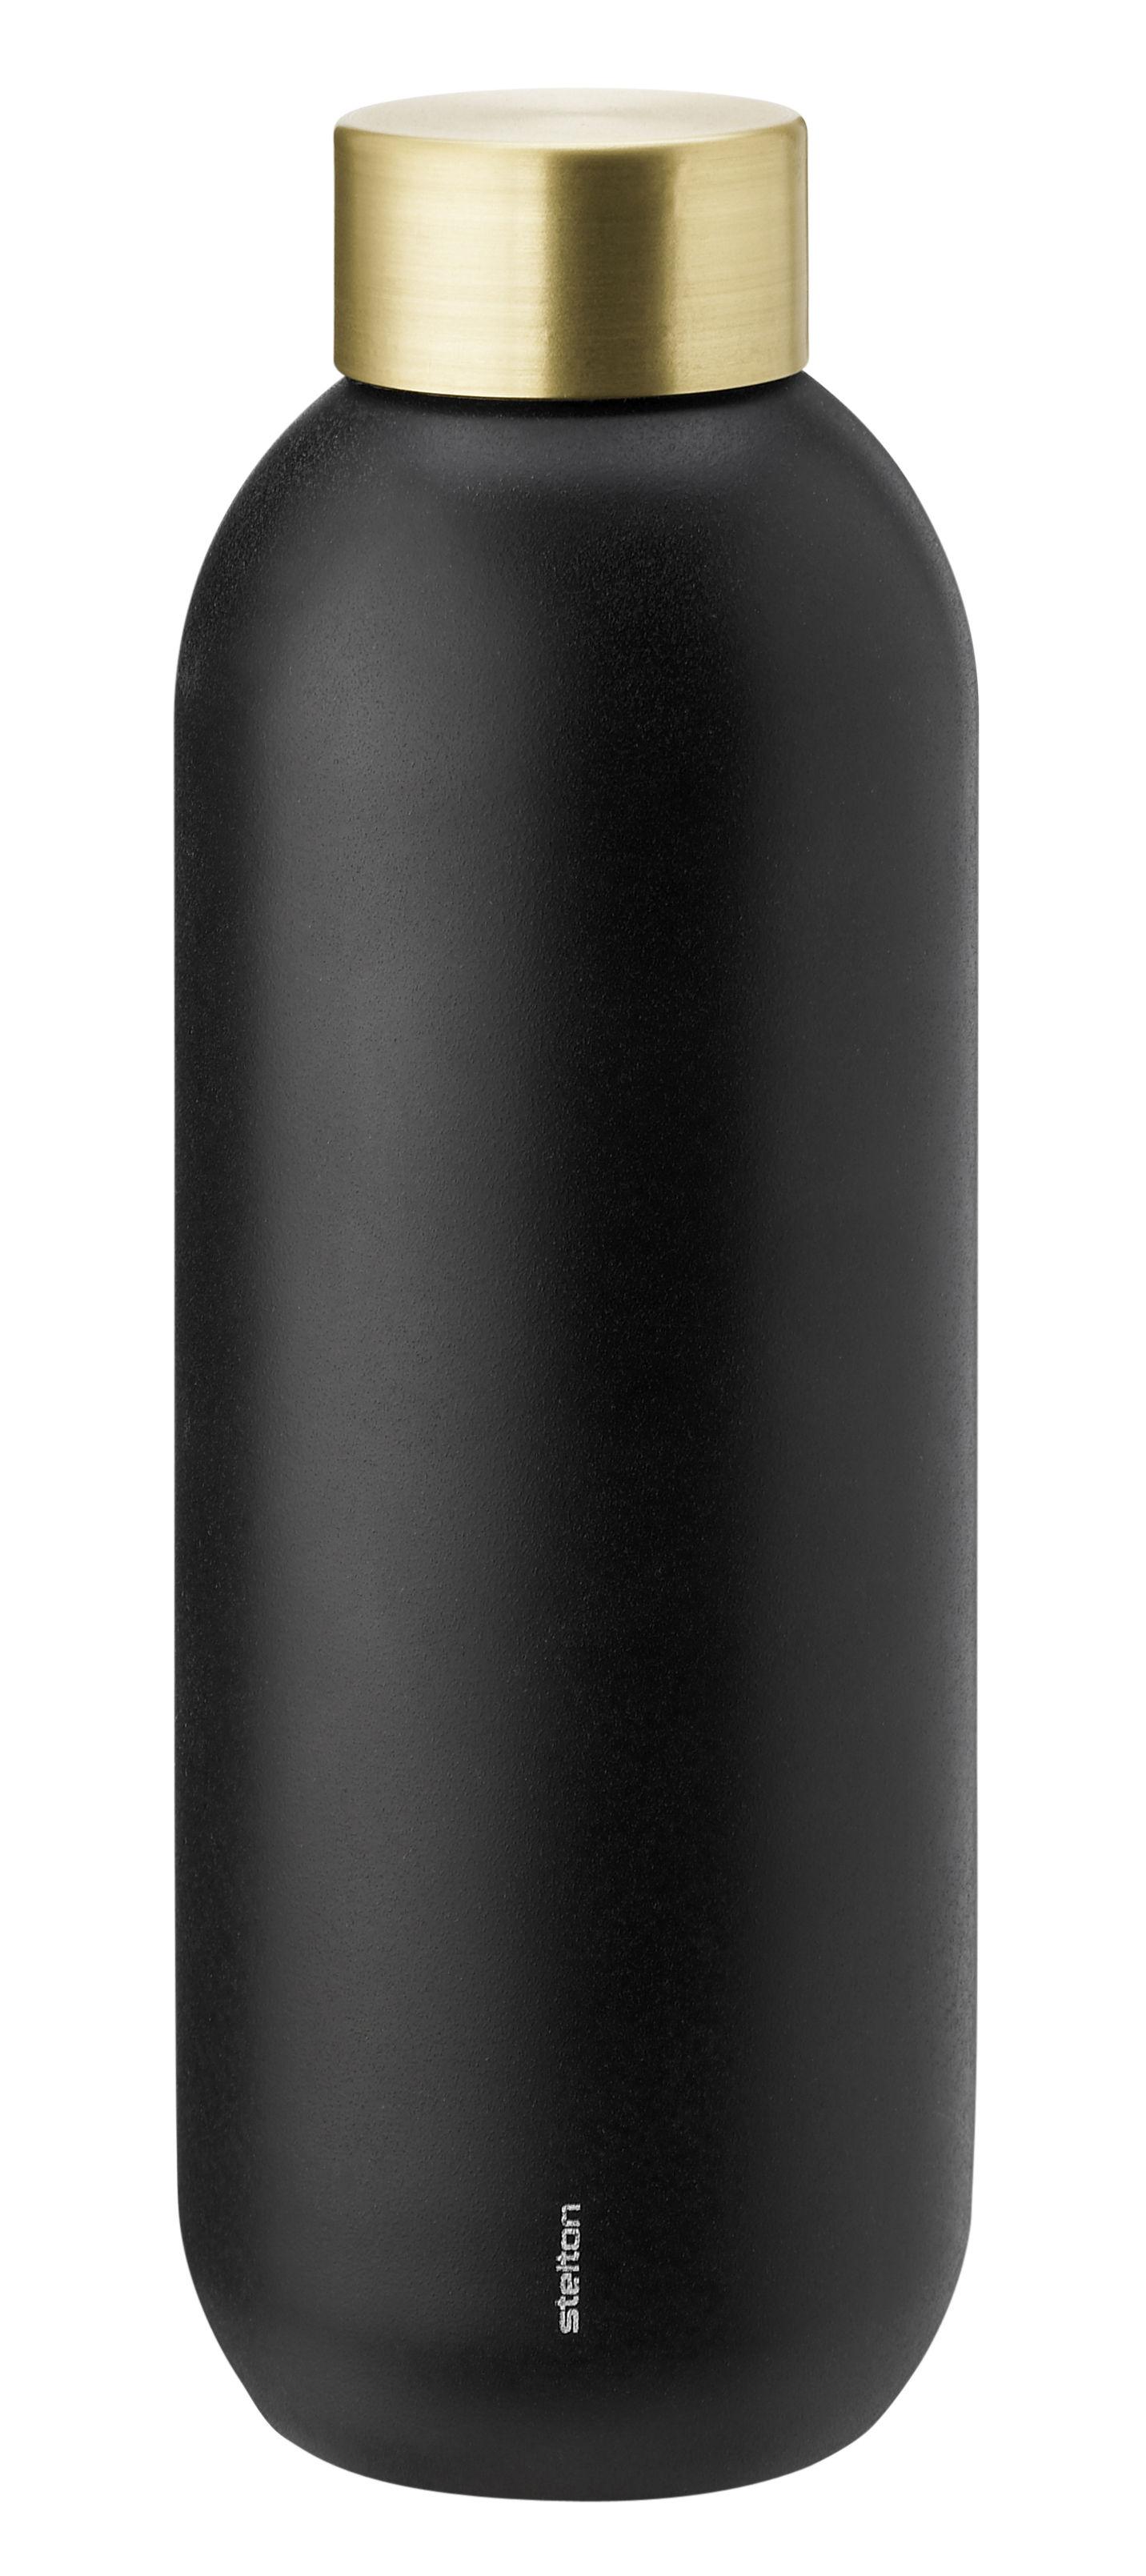 Tischkultur - Karaffen - Collar Flasche / 0,75 l - Stelton - Schwarzmatt & messingfarben - Acier inoxydable revêtu de laiton, Acier inoxydable revêtu de Téflon®